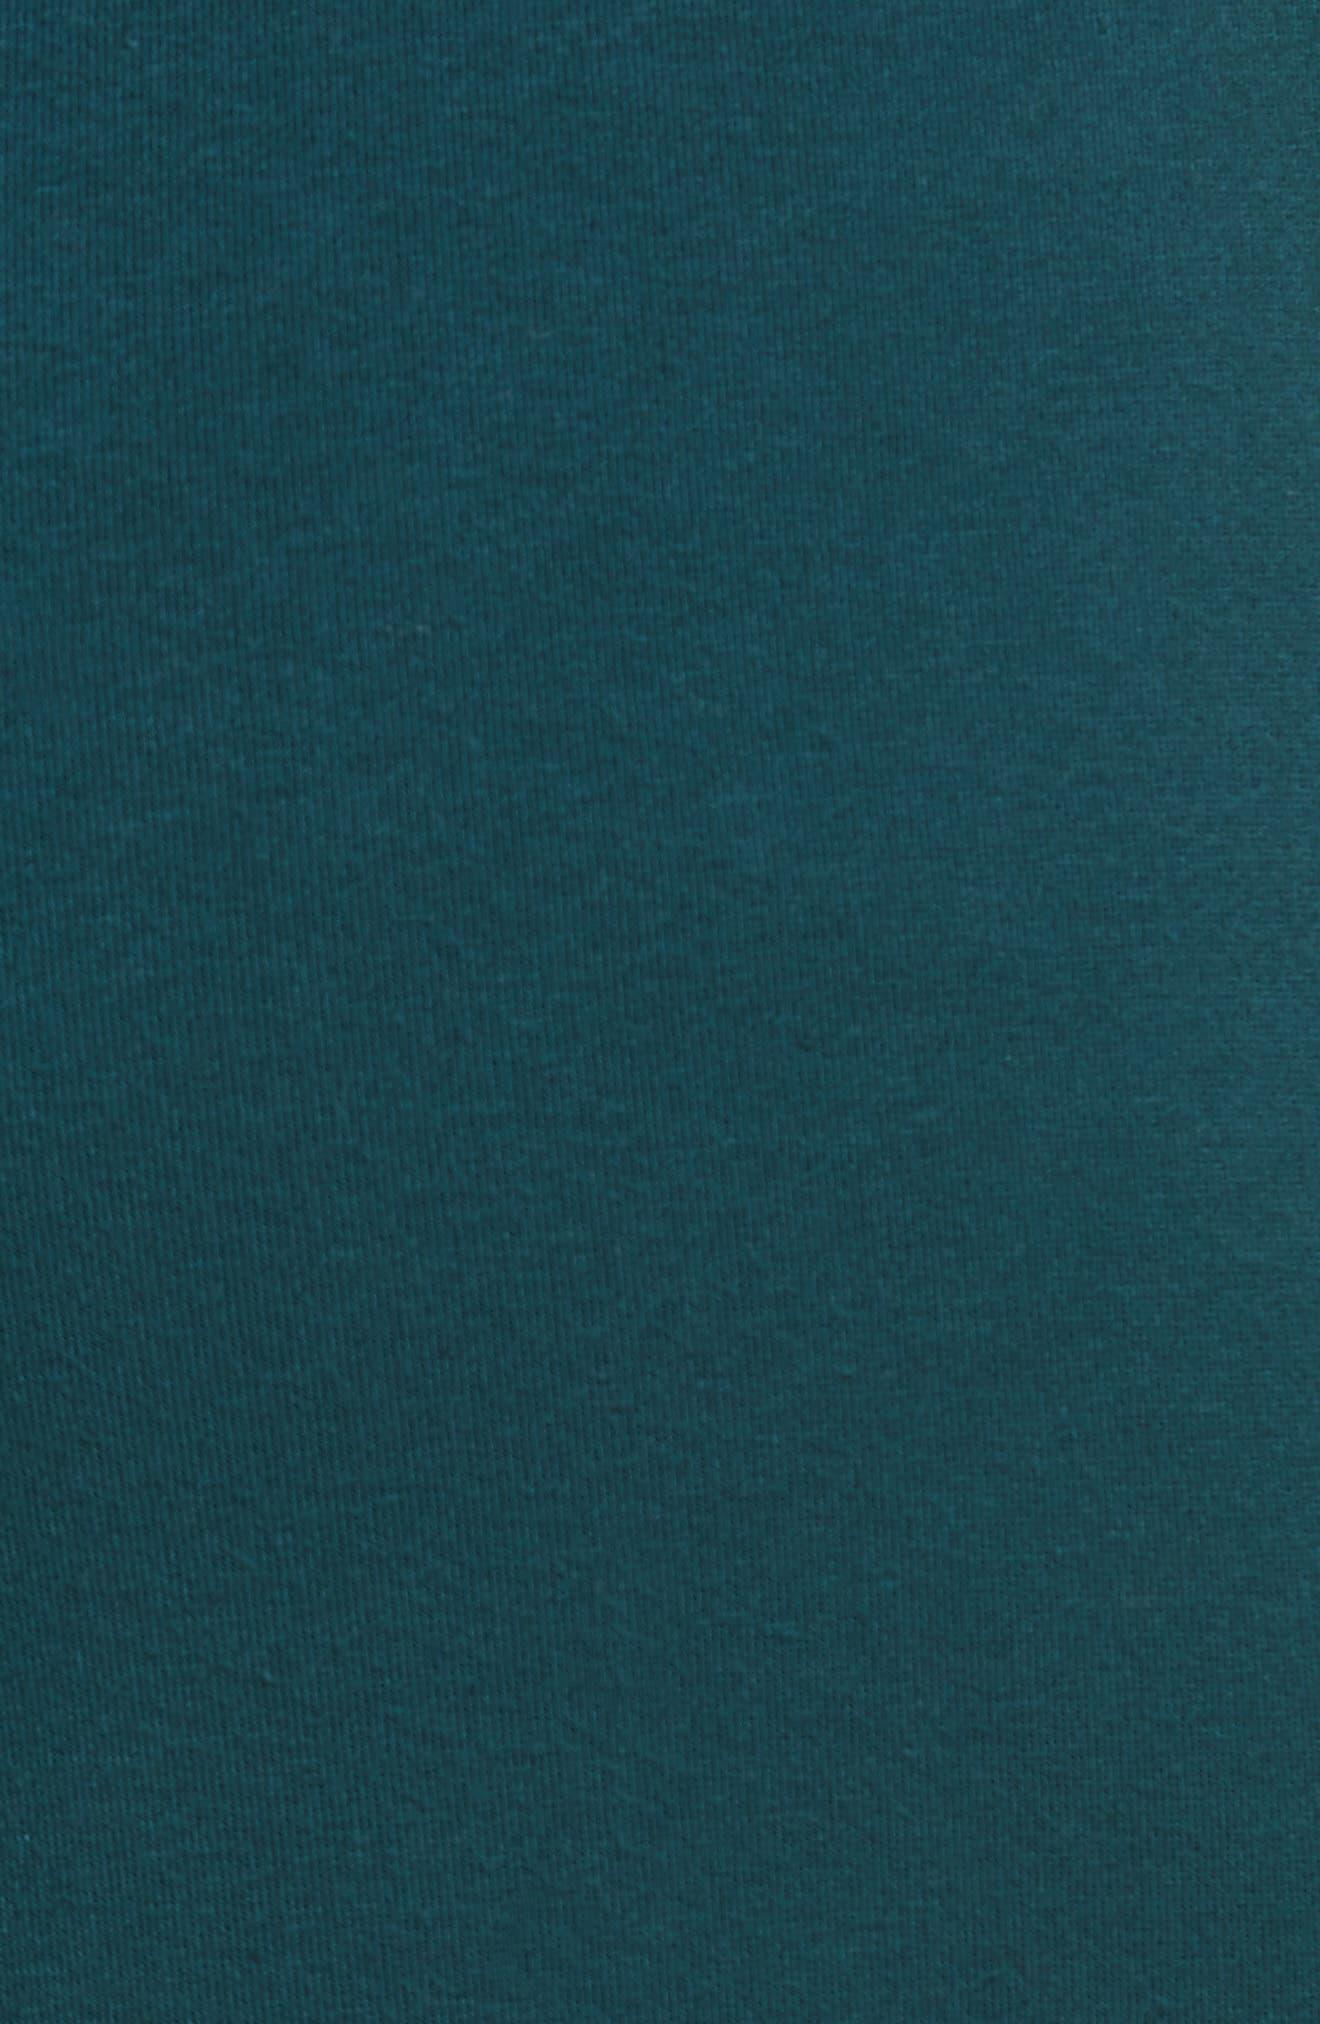 Double Axel Jogger Pants,                             Alternate thumbnail 5, color,                             Turquoise